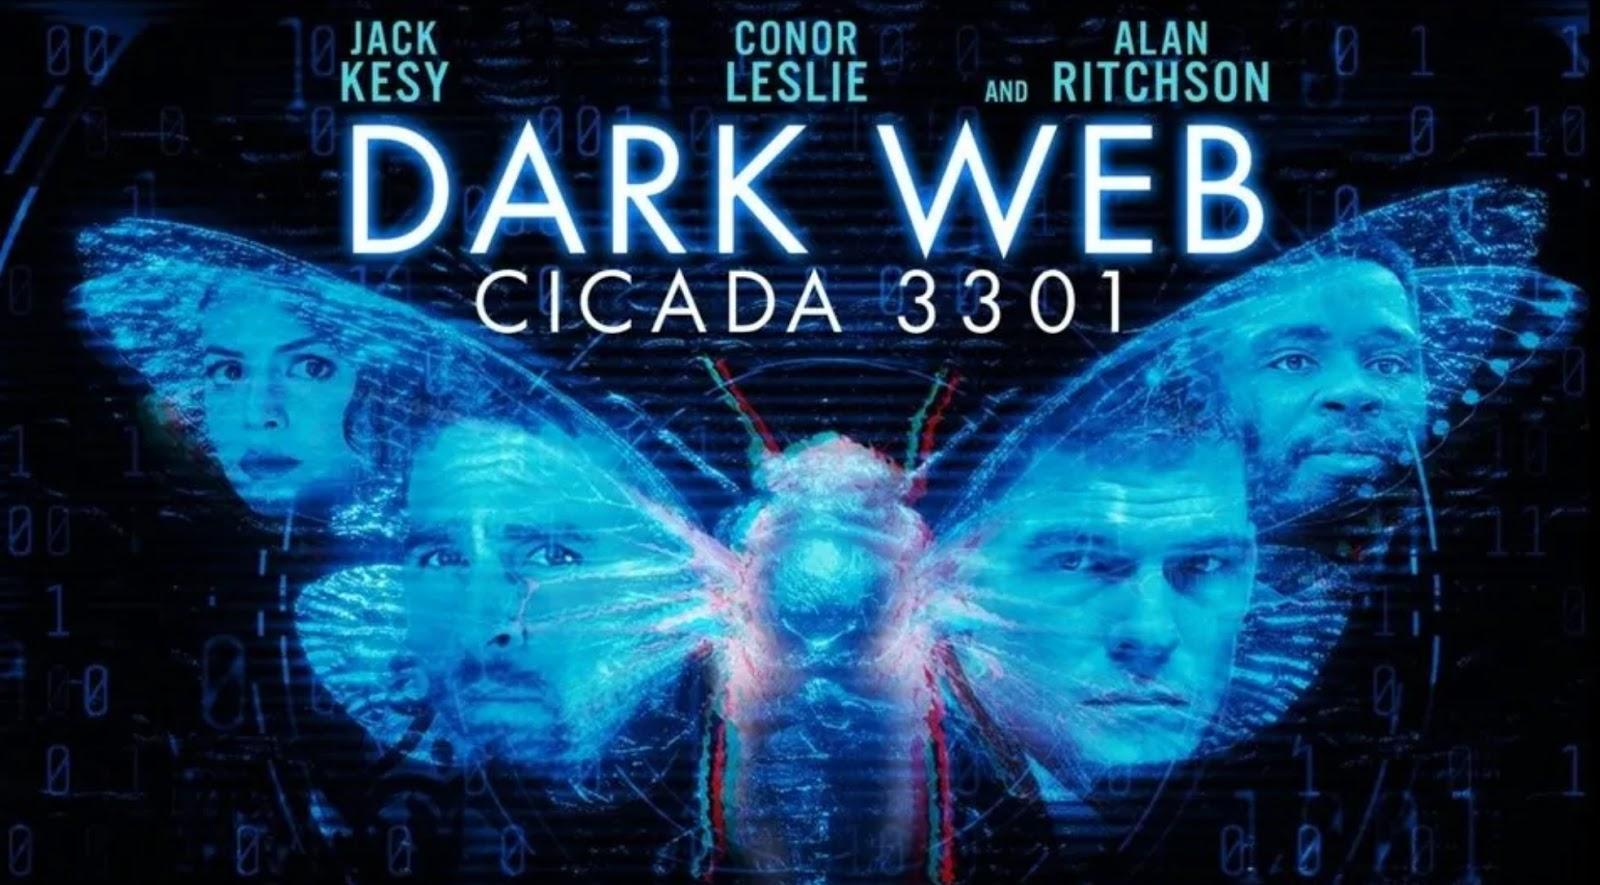 The film Dark Web is based on the secretive Cicada 3301 society